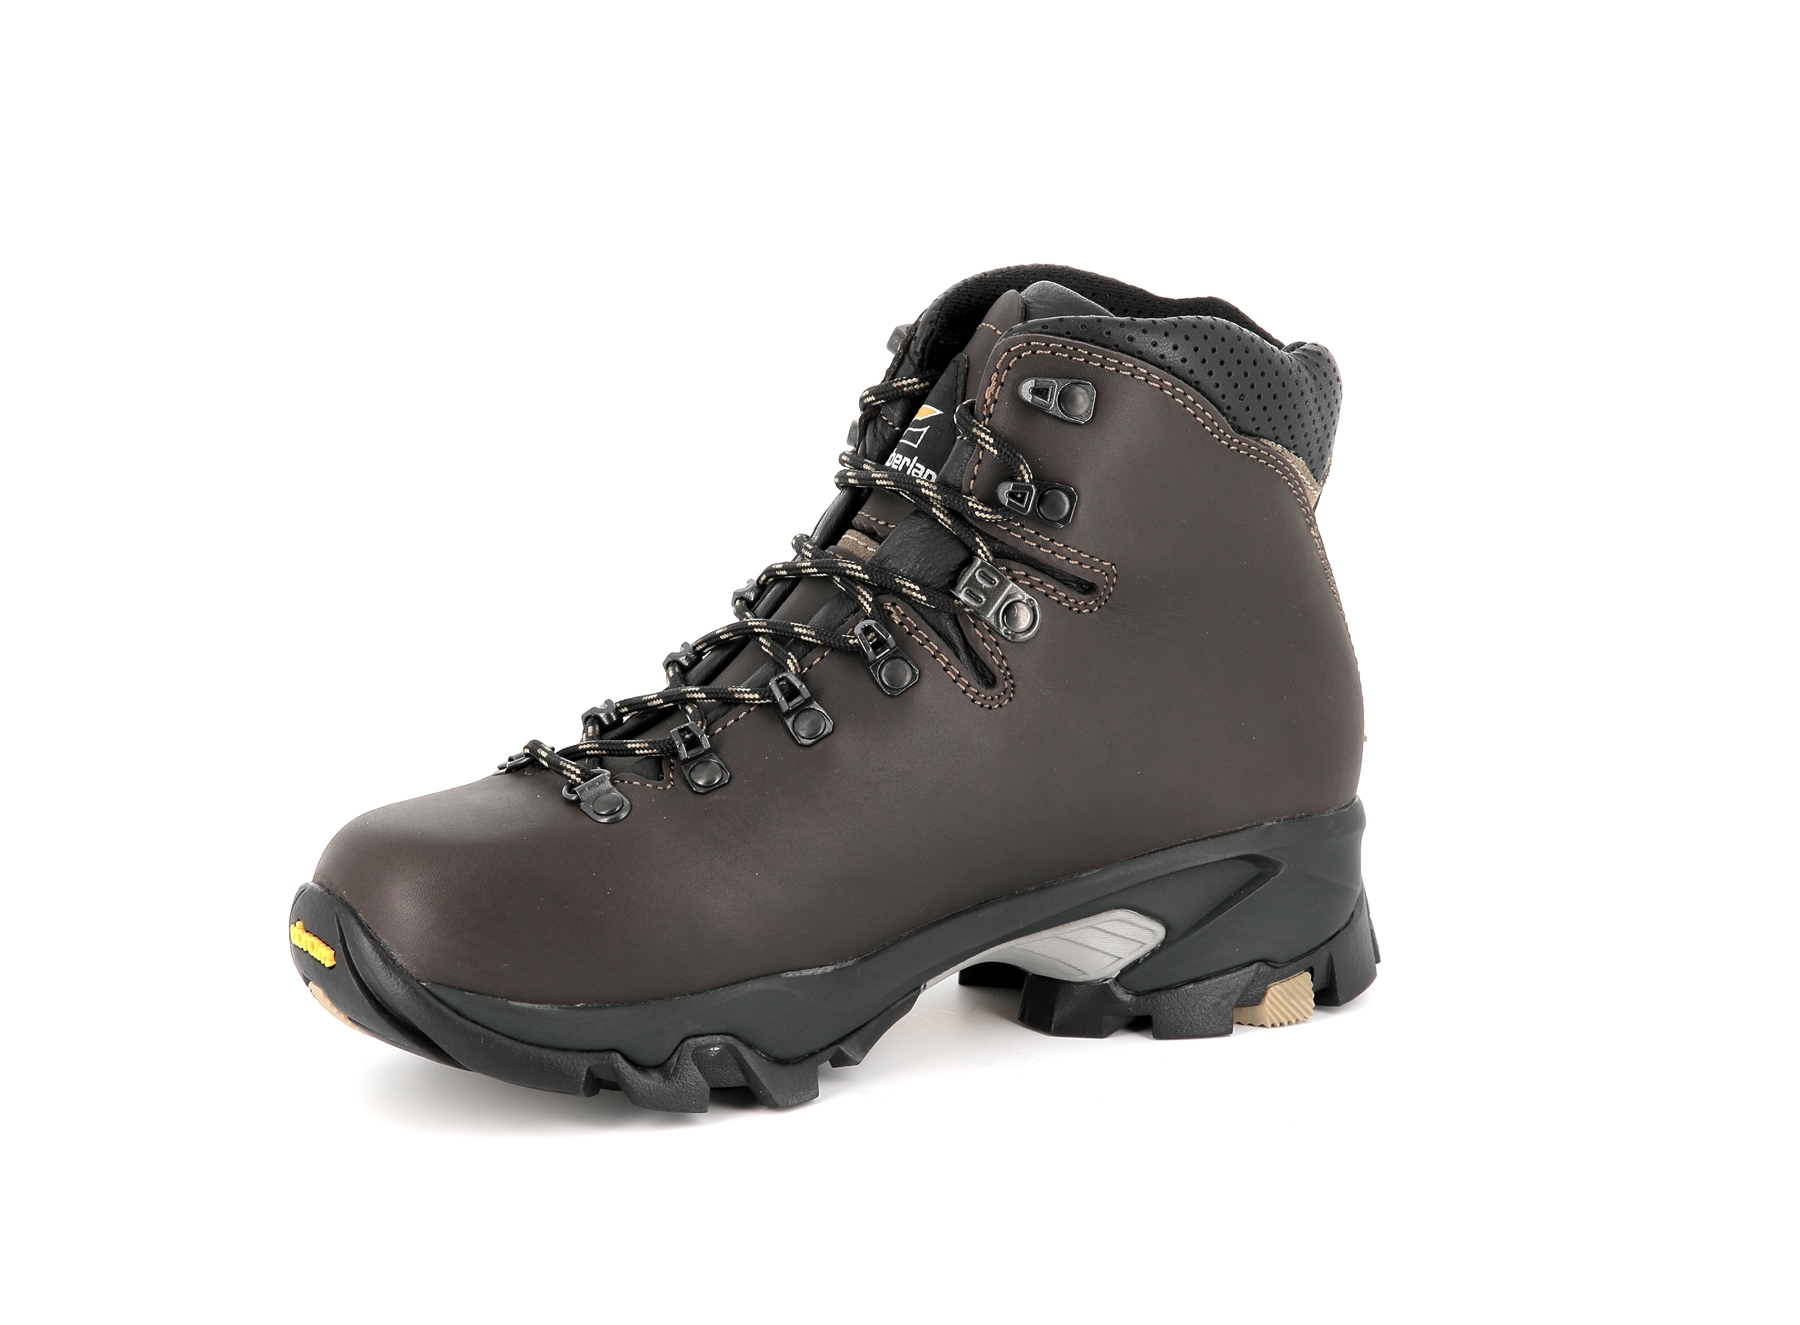 1d533c98aec 996 VIOZ GTX® WNS - Dark Brown Women's Trekking Boots Zamberlan | Zamberlan